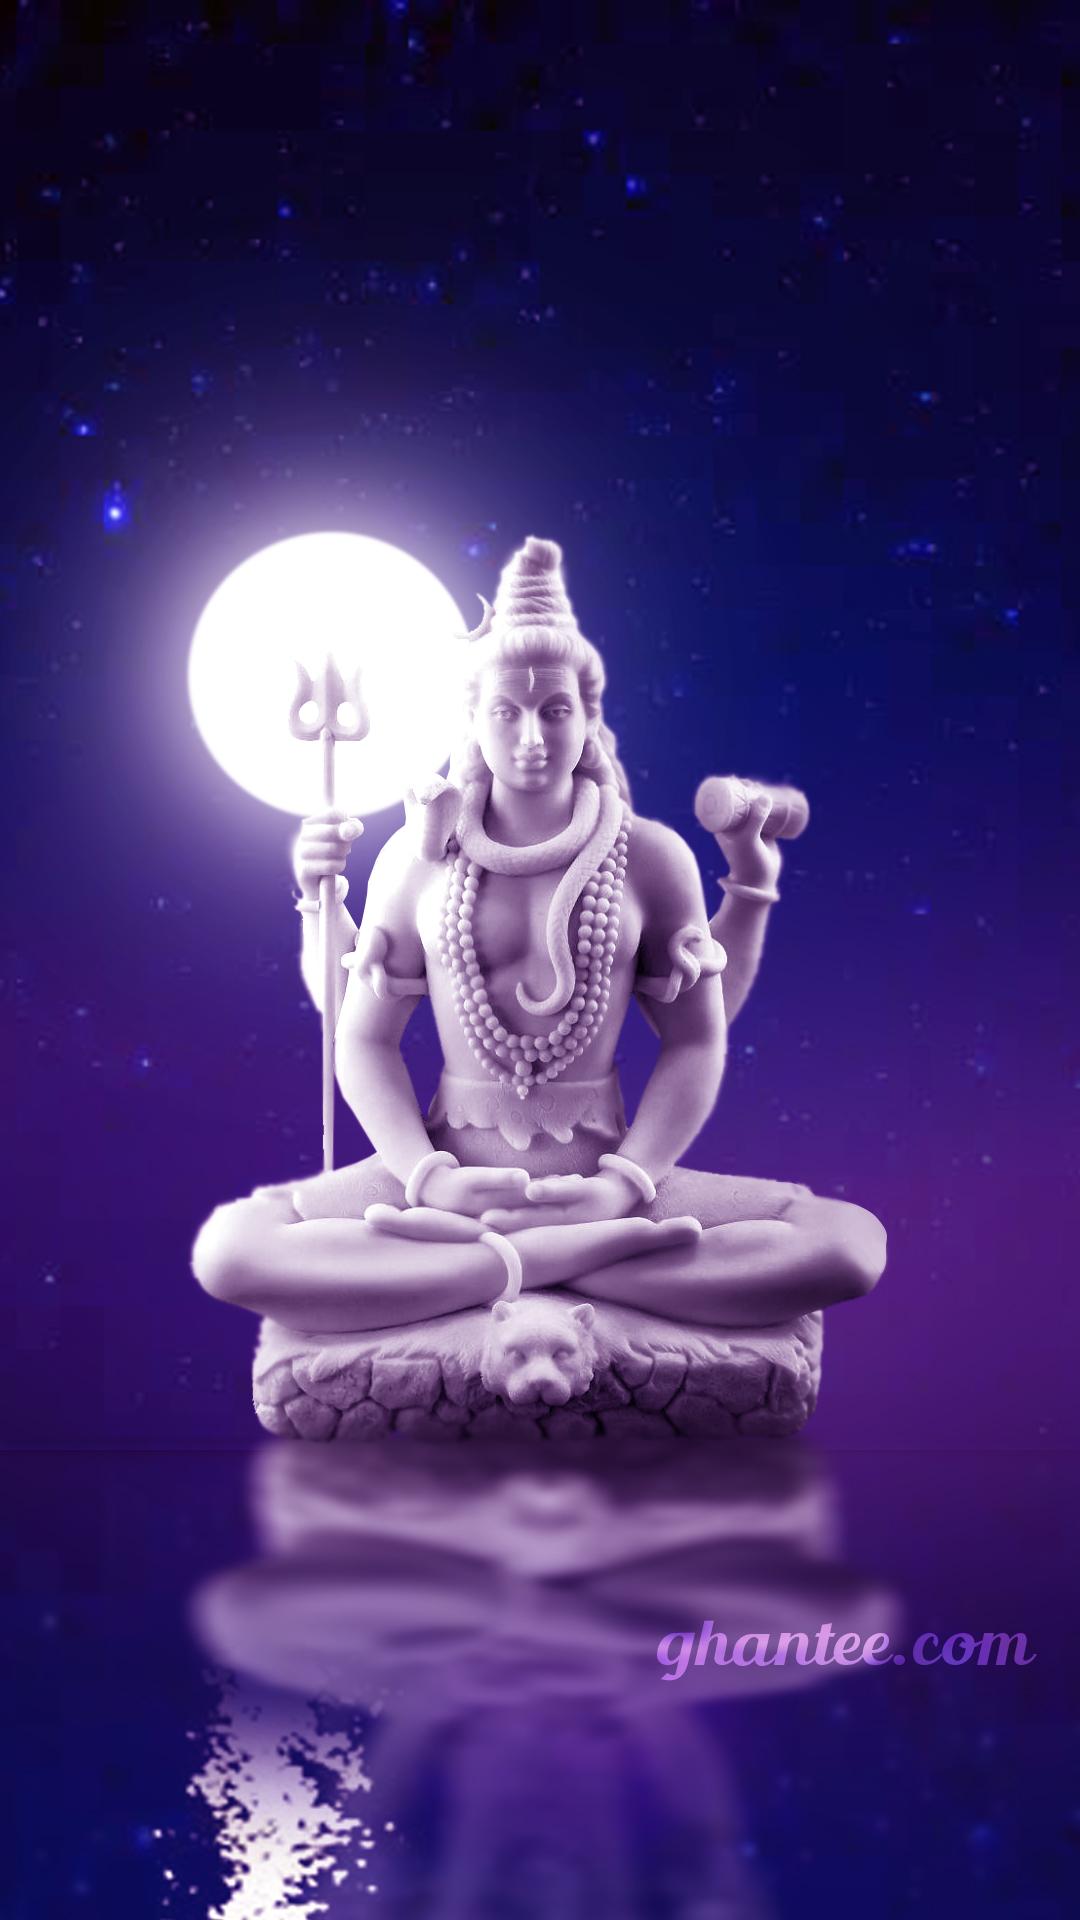 mahadev white statue image hd wallpaper